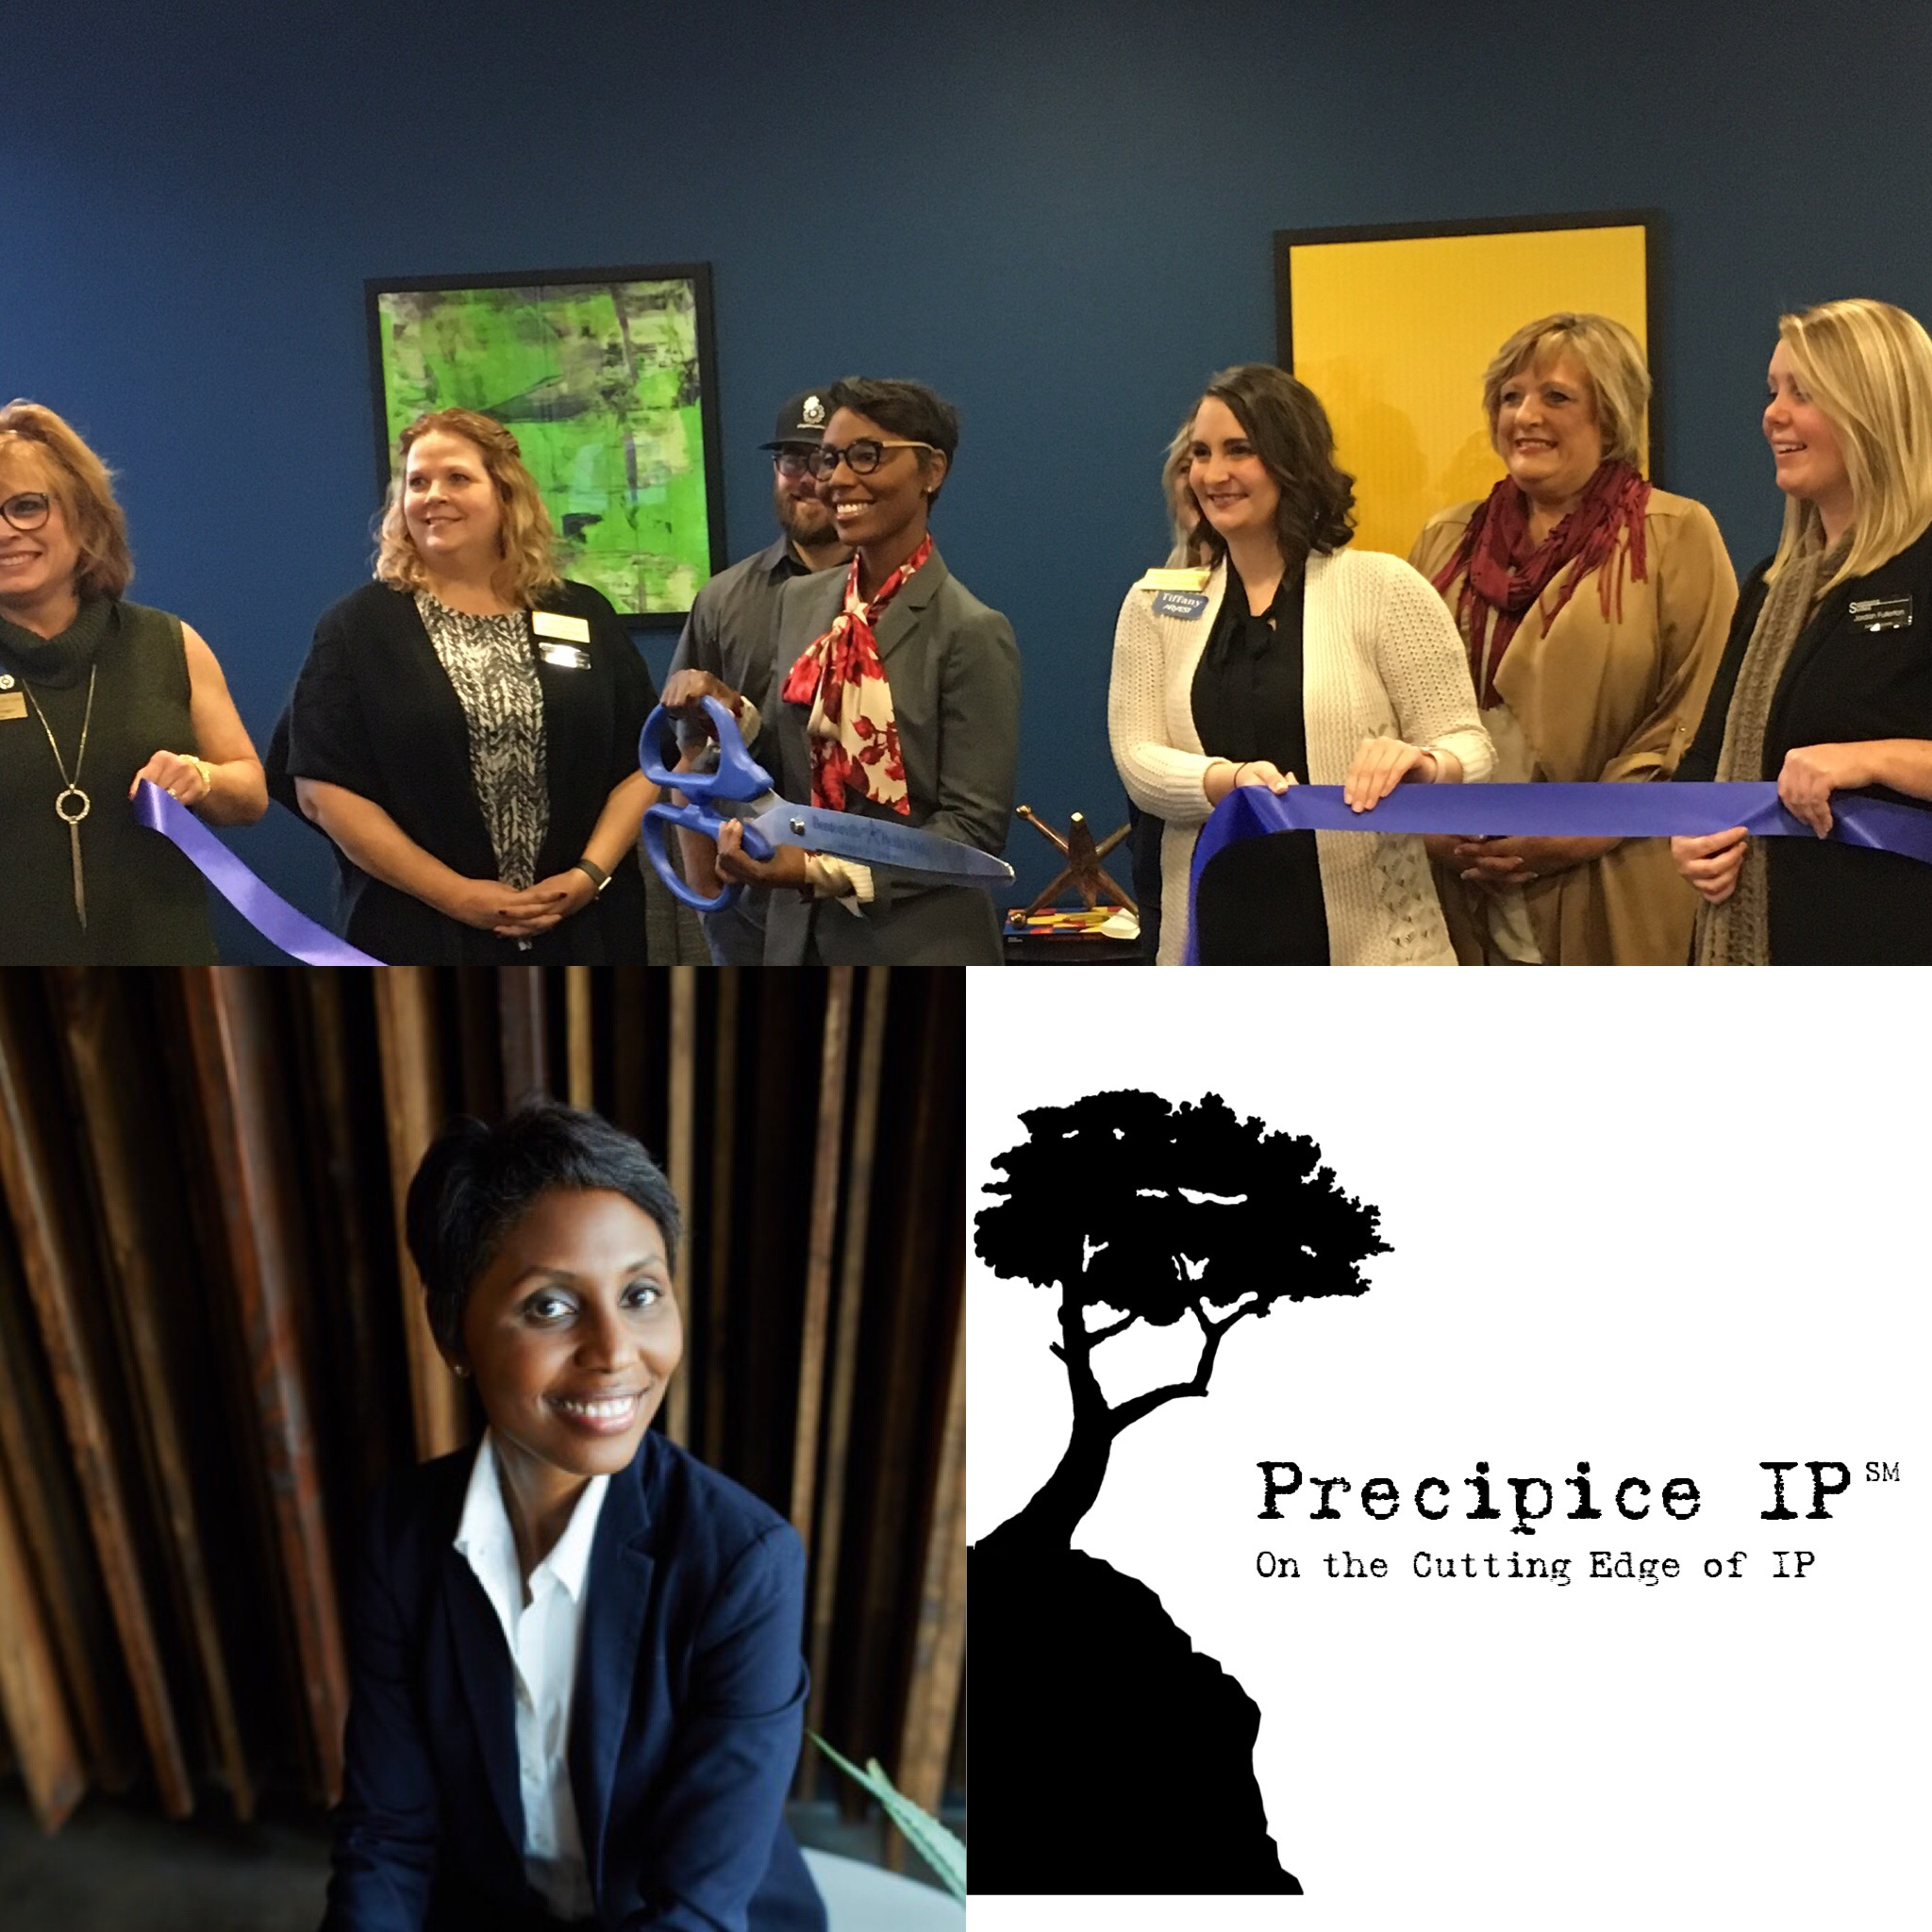 Angela J Grayson (Principal, Precipice IP, PLLC) and the Bentonville-Bella Vista Chamber of Commerce ribbon cutting